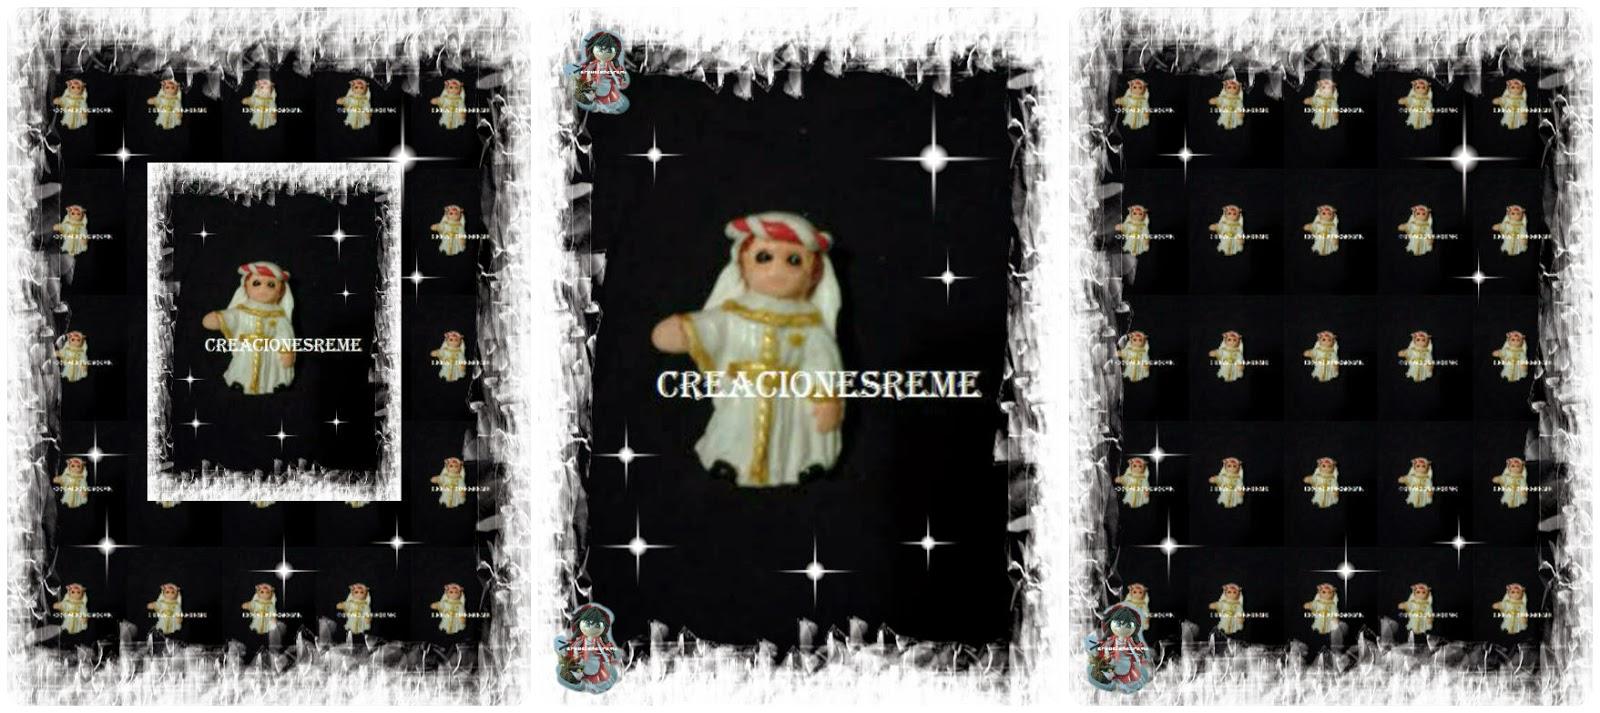 fofucha-creacionesreme-enfermera-oculista-personalizadas-foami –perrito-muñecas artesanas-alcala de henares -fofuchas-medico-bailarina-escenario-alcala de henares-CASCO –MOTO-novios-boda-campanilla-coche-caballo-perro-goma-eva-fofucho-perrito-animales-goma eva-mecanico- vidente-goma-eva-CONEJITO-perrito-princesa-goma-eva-fofucha-princesa-fofucho-perrito-fofucho-caballo-enfermera-oculista-animalitos de –goma-eva-perritos-de-goma-eva-zapatillas-goma-eva-ANIMALITOS DE GOMA EVA-REAL-MADRID-NUEVA-EQUIPACION-FOFUCHO-caballo-goma-eva-peña-abejorros-NOVIOS GOMA –EVA-PERSONALIZADOS-muñequito-personalizado-abogado-fofucha –baloncesto-muñequito-personalizado-real-madrid-chupetes de goma eva-sevillana-bata de-cola-fofucho-atletico-madrid –bodas de oro-torero- de goma eva –toro –de-goma-eva-pastor-fofucho-oveja-goma –eva-tarta-boda-perro- Guggenheim-muñequito-personalizado-guardia-fofucho-perro-real-cupido-goma-eva-fofucho-san-valentin-fofucho baloncesto-pelota baloncesto-de –goma-eva-moldes-perros-fofuchas-moldes-animalitos –PERRITOS MODELADOS-colegio-escolapios-cuna de –goma-eva-futbolista-camarma-fofucha abogada-fofucha-coleta-bolso-fofucha-broches semana-santa